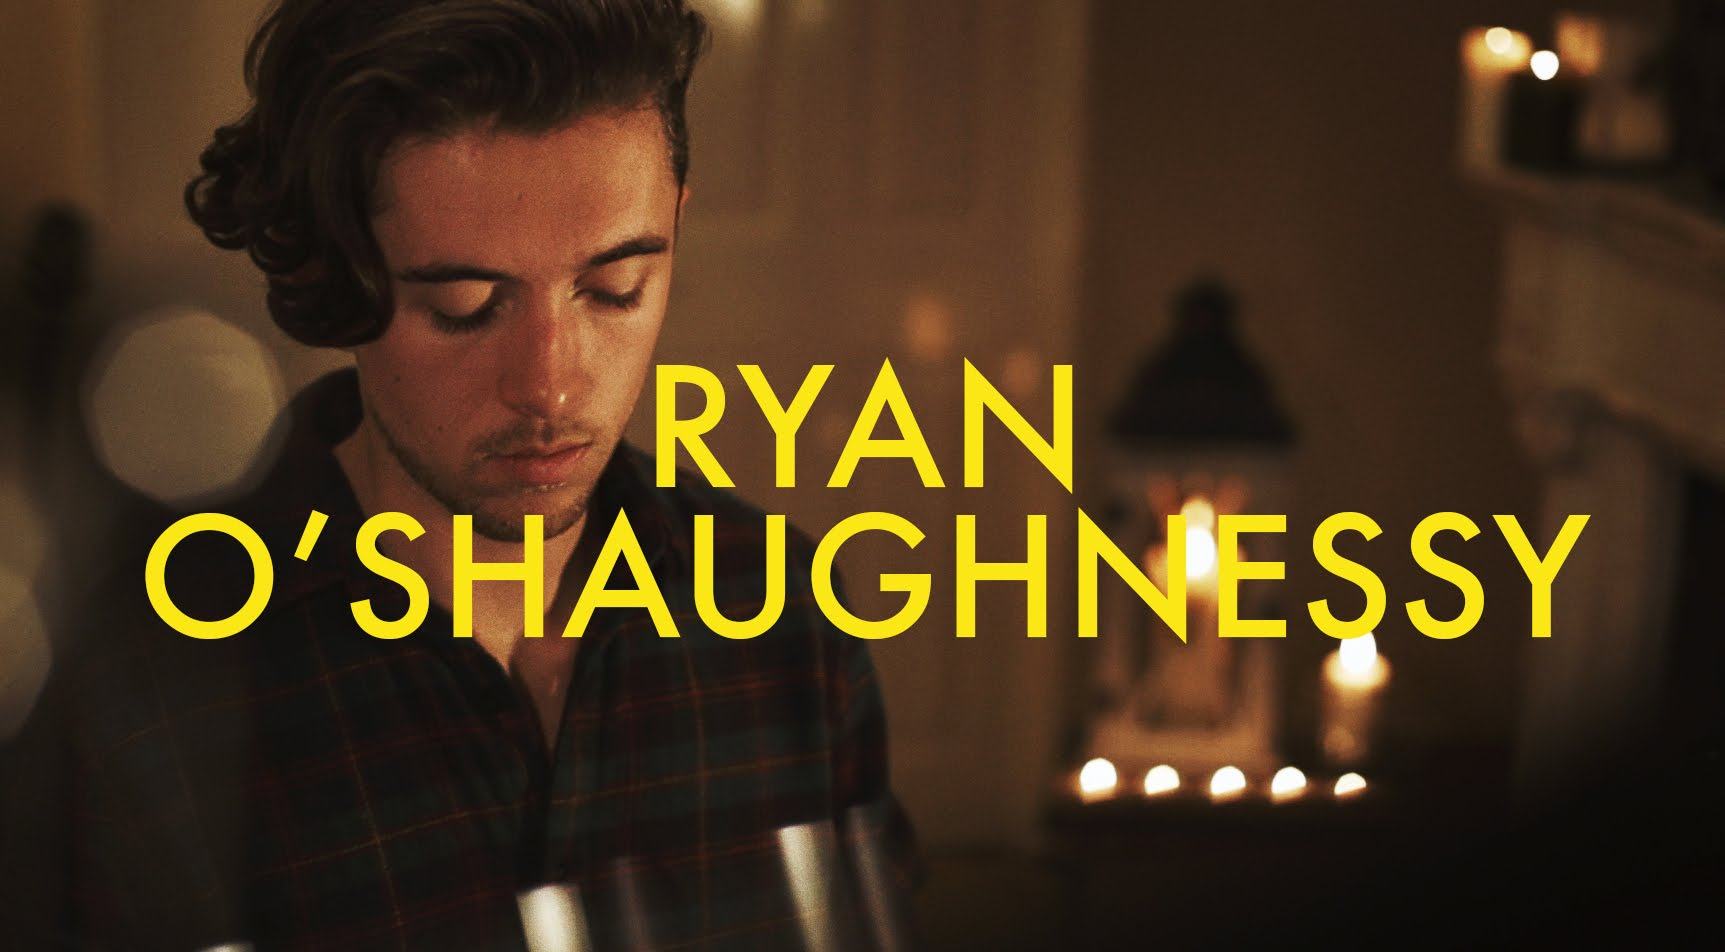 Ireland: Ryan O'Shaughnessy to fly the Irish flag in Lisbon